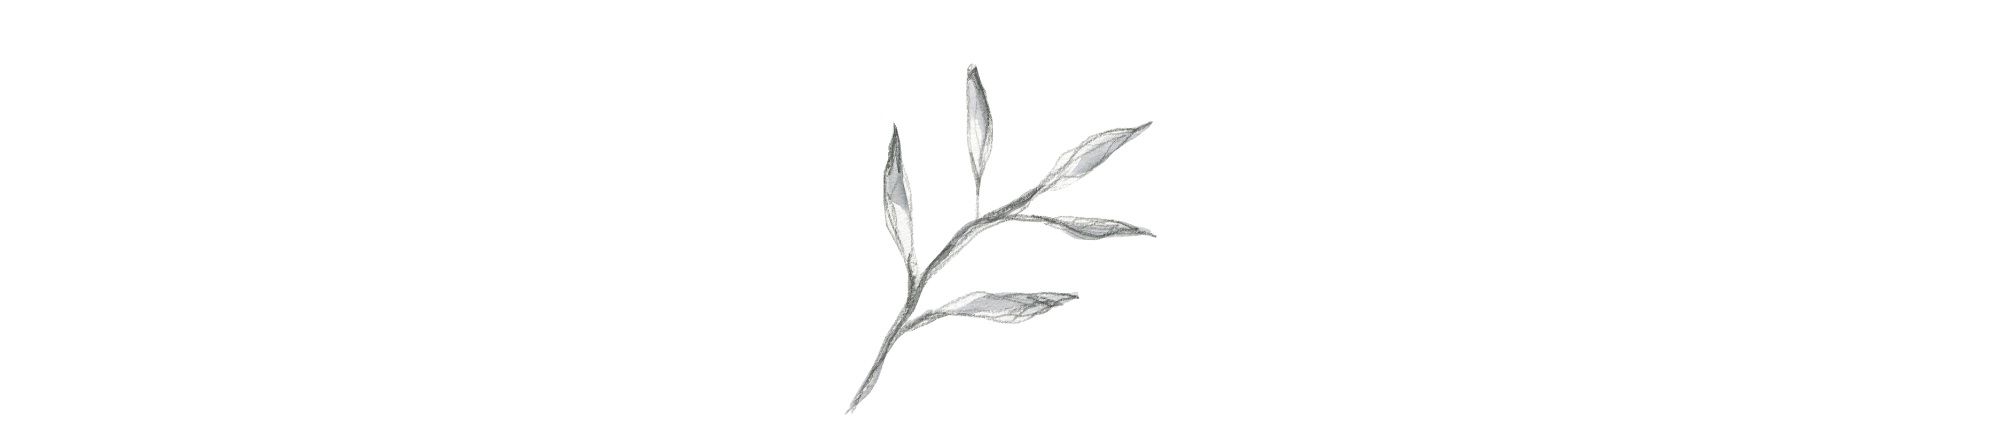 leaf-illustration.jpg